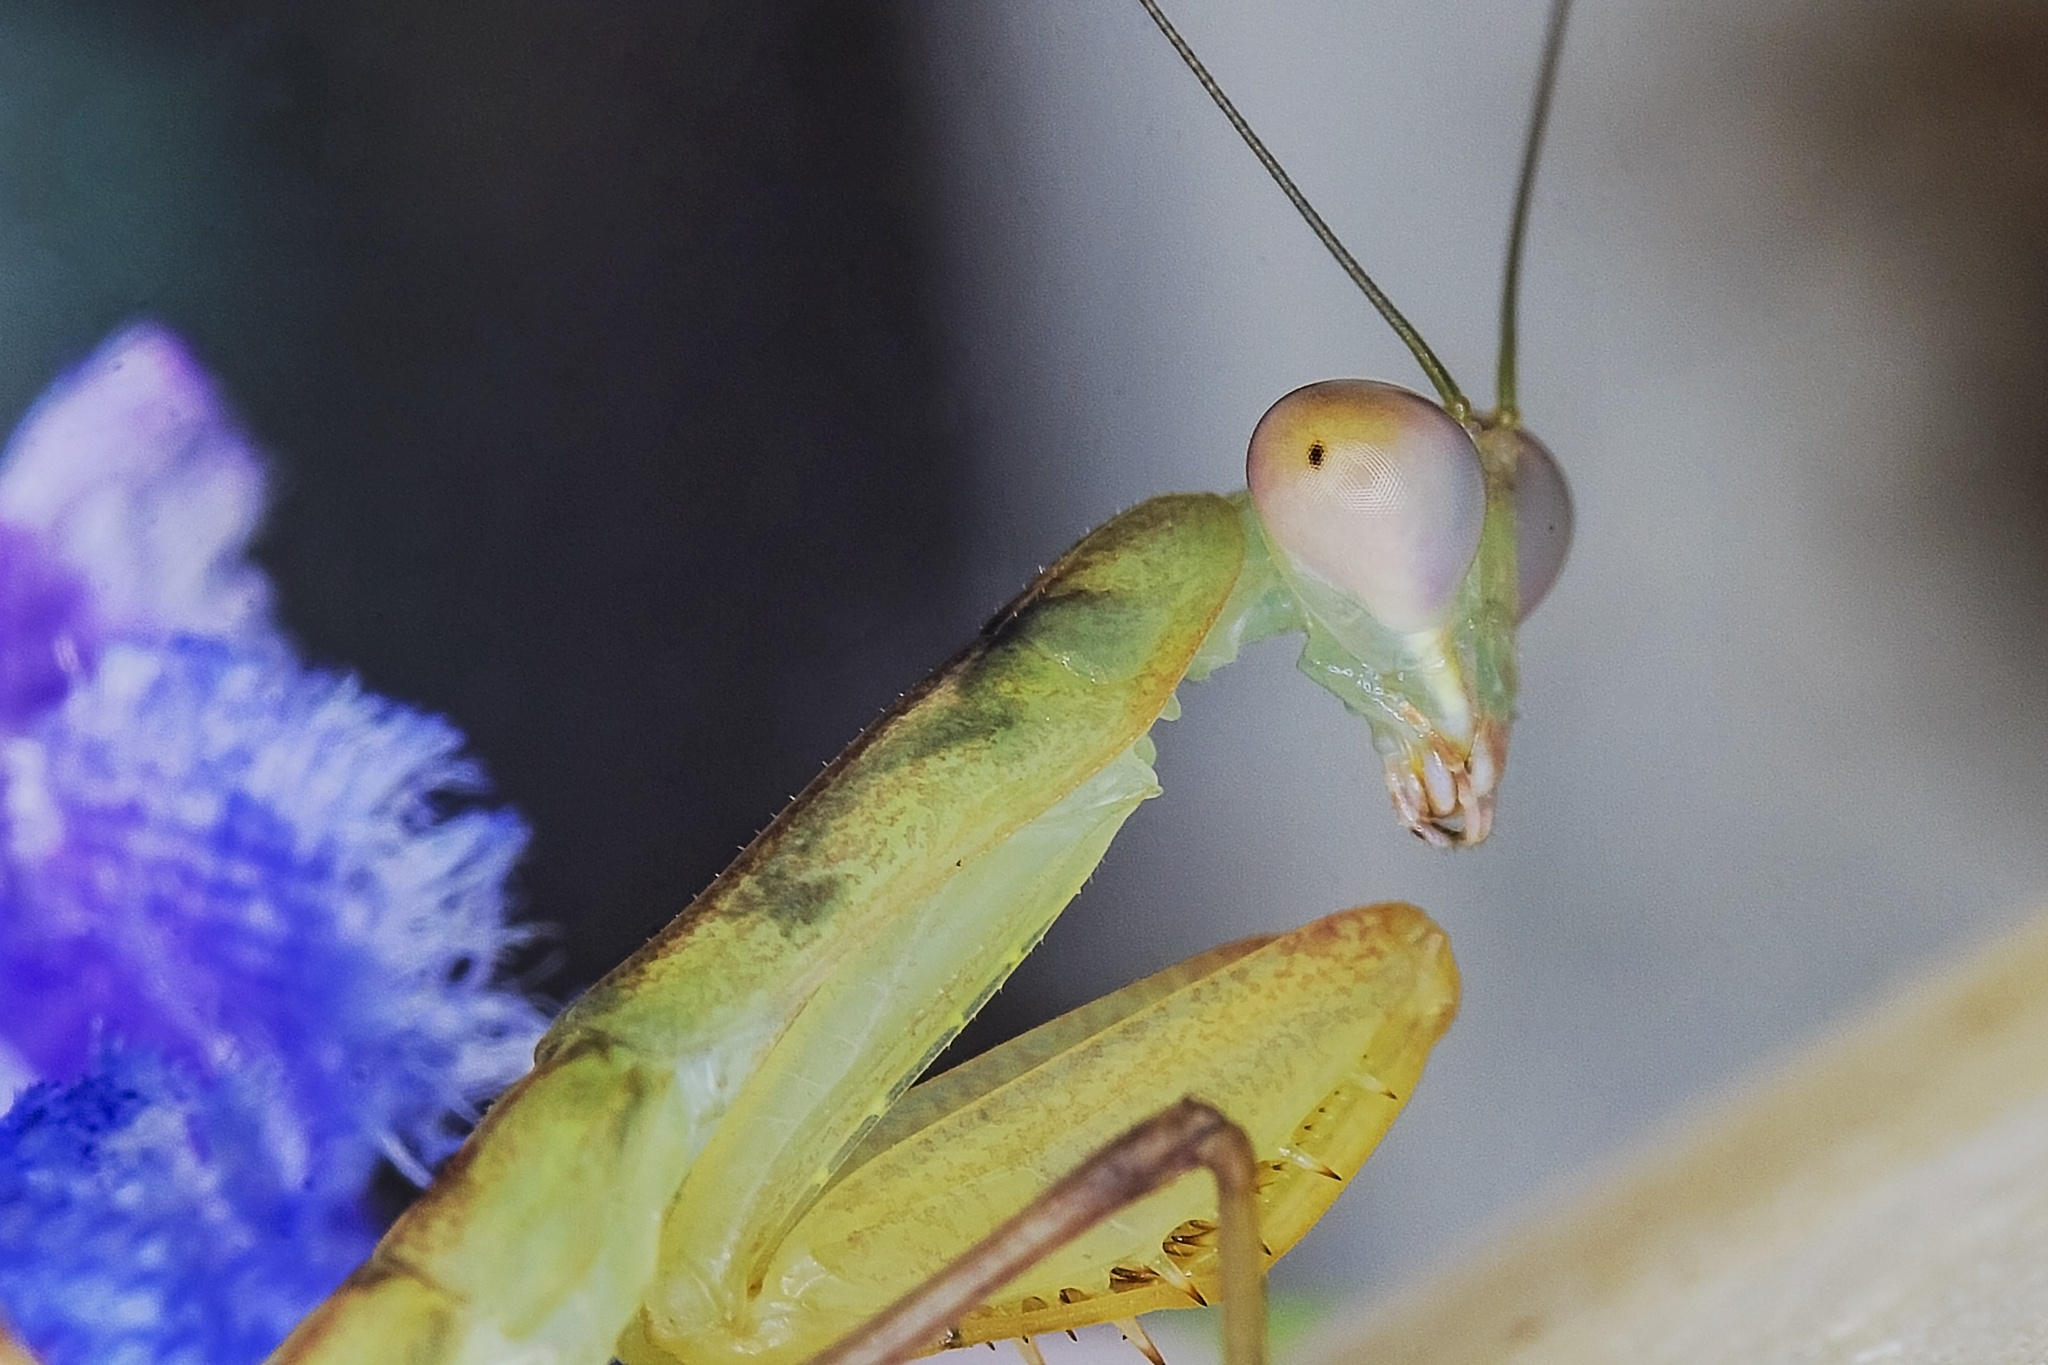 Mantis Looking Back by Dave Bremner